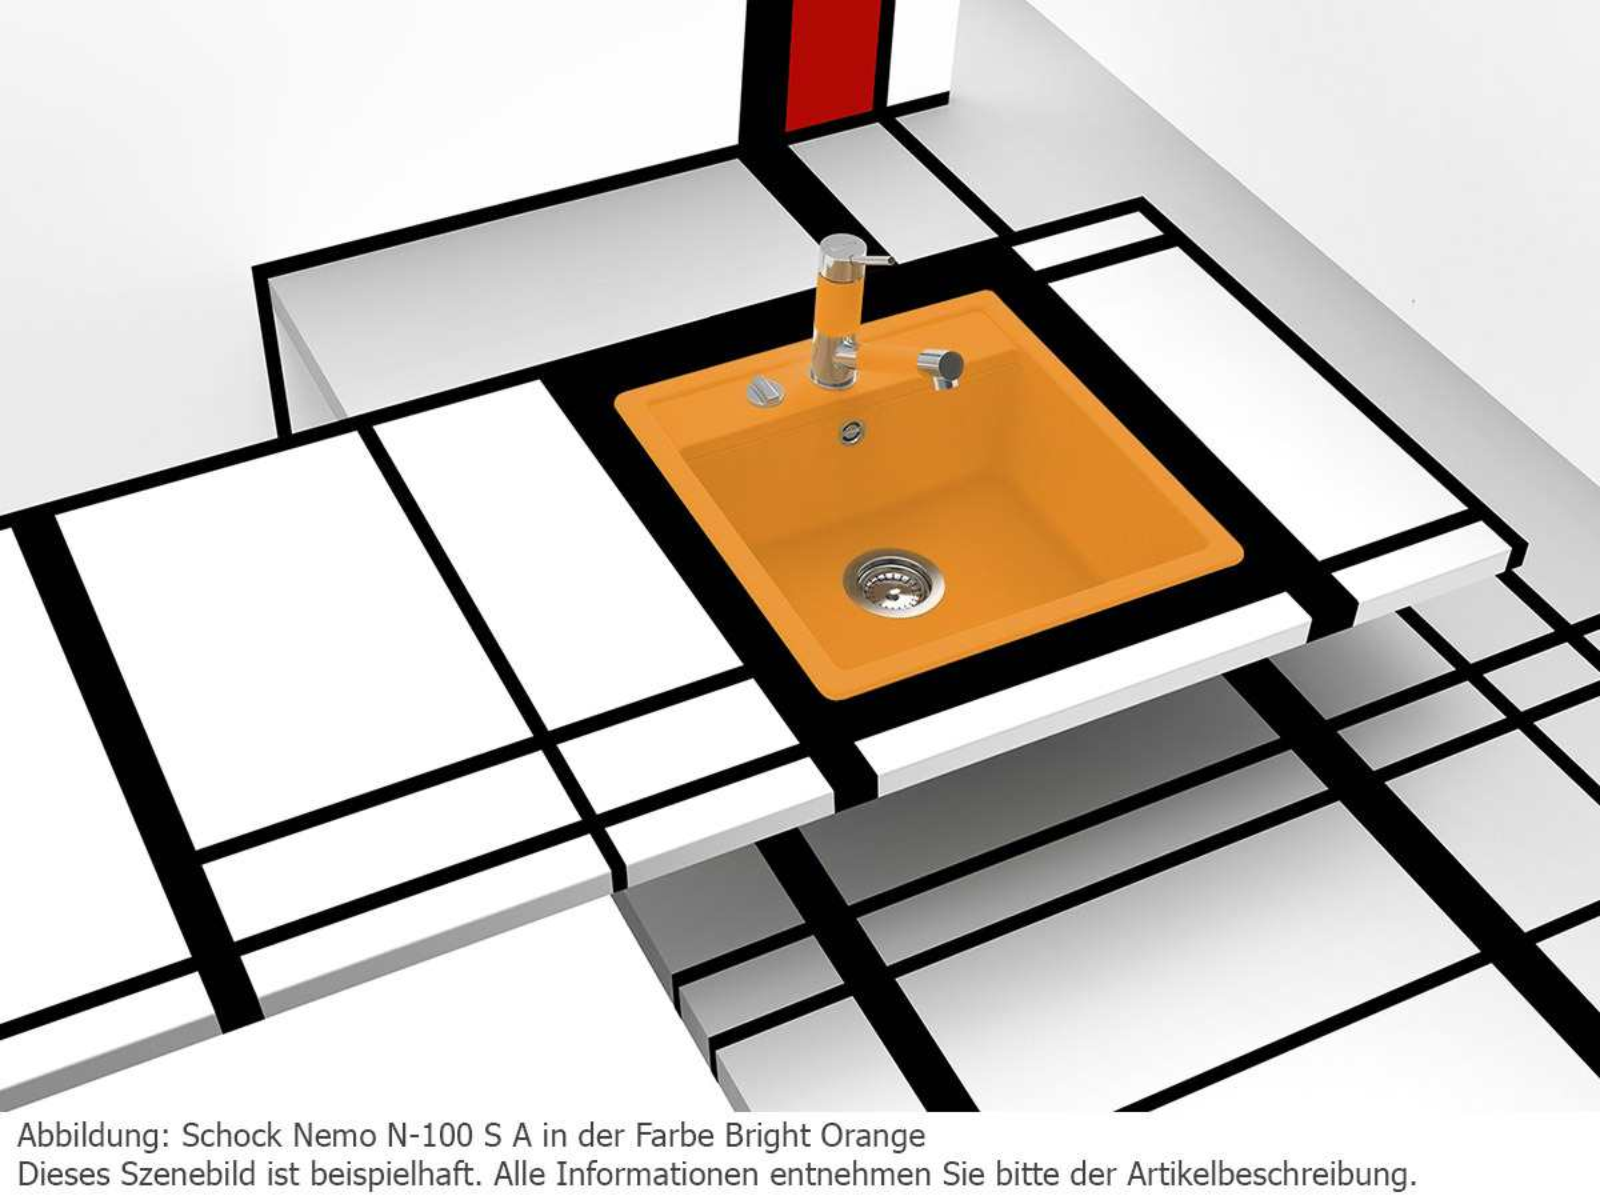 Schock Nemo N-100S A Croma - NEMN100SAGCR Granitspüle